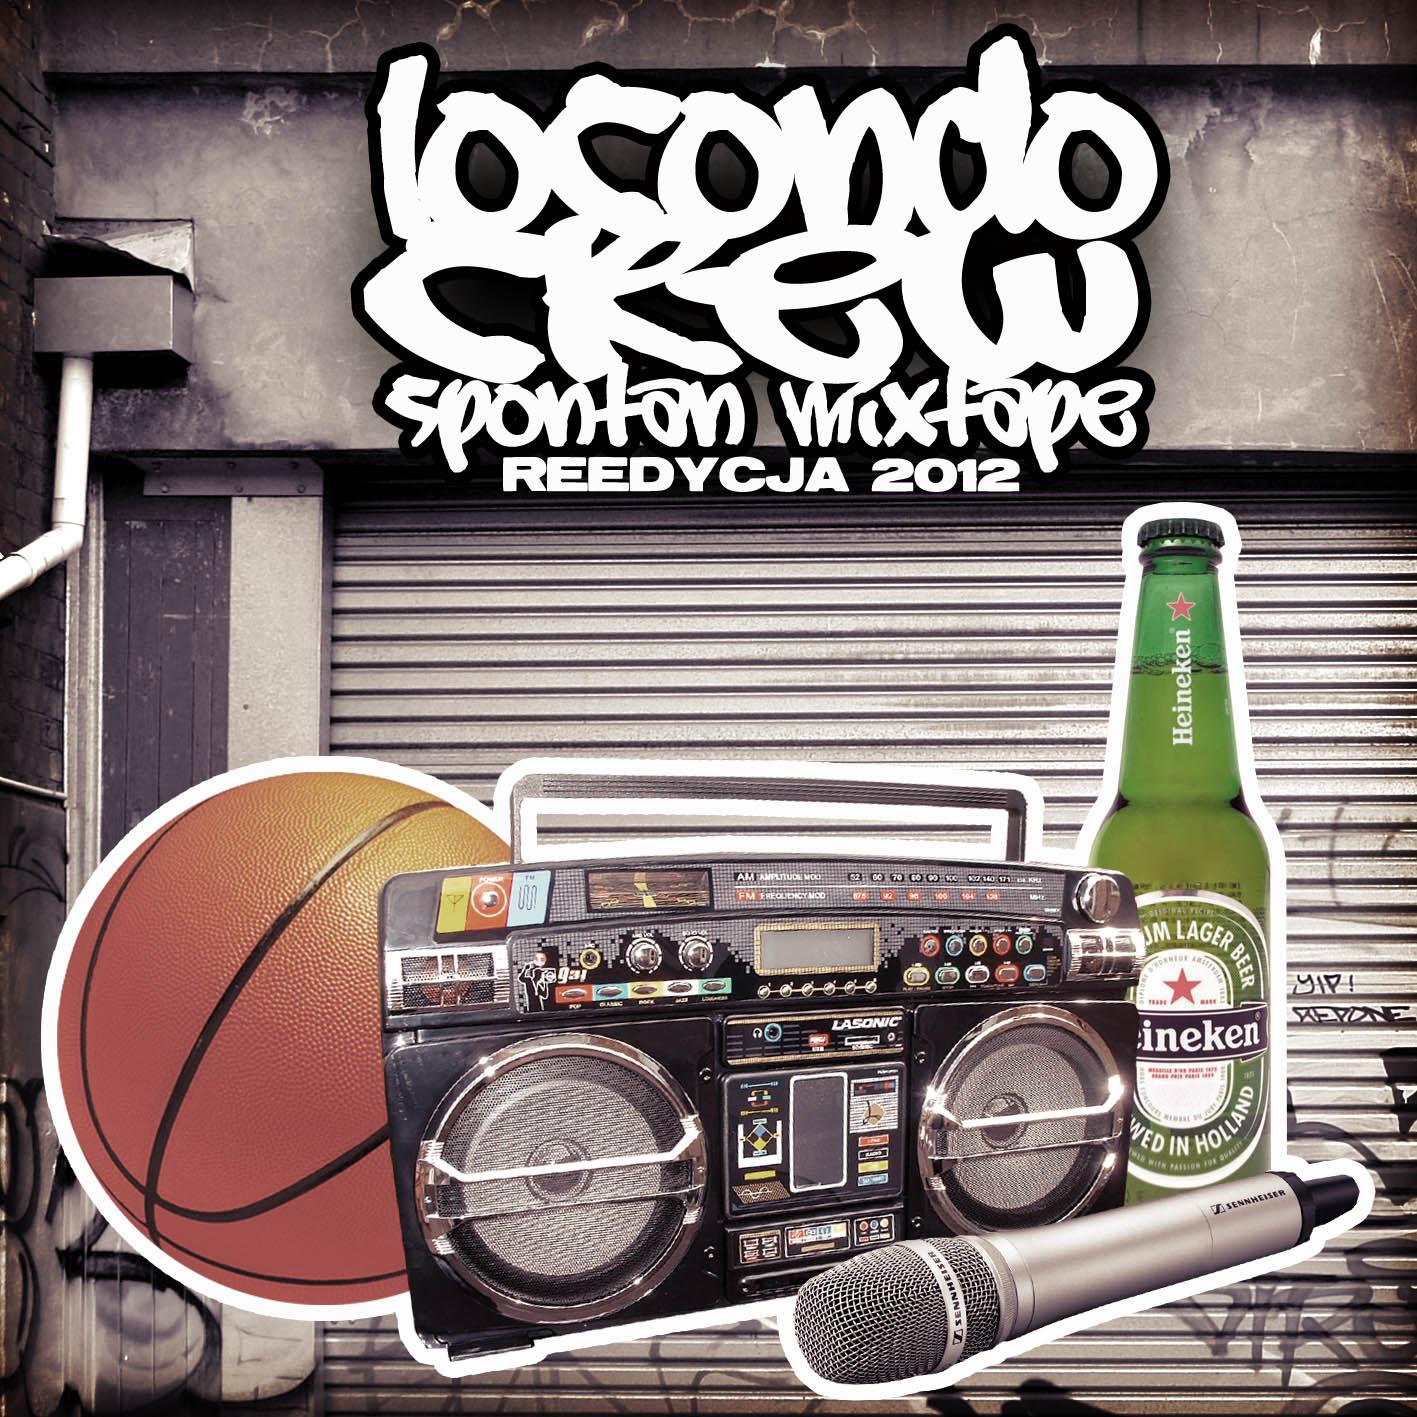 Locondo Sponto - Spontan Mixtape CoverArt